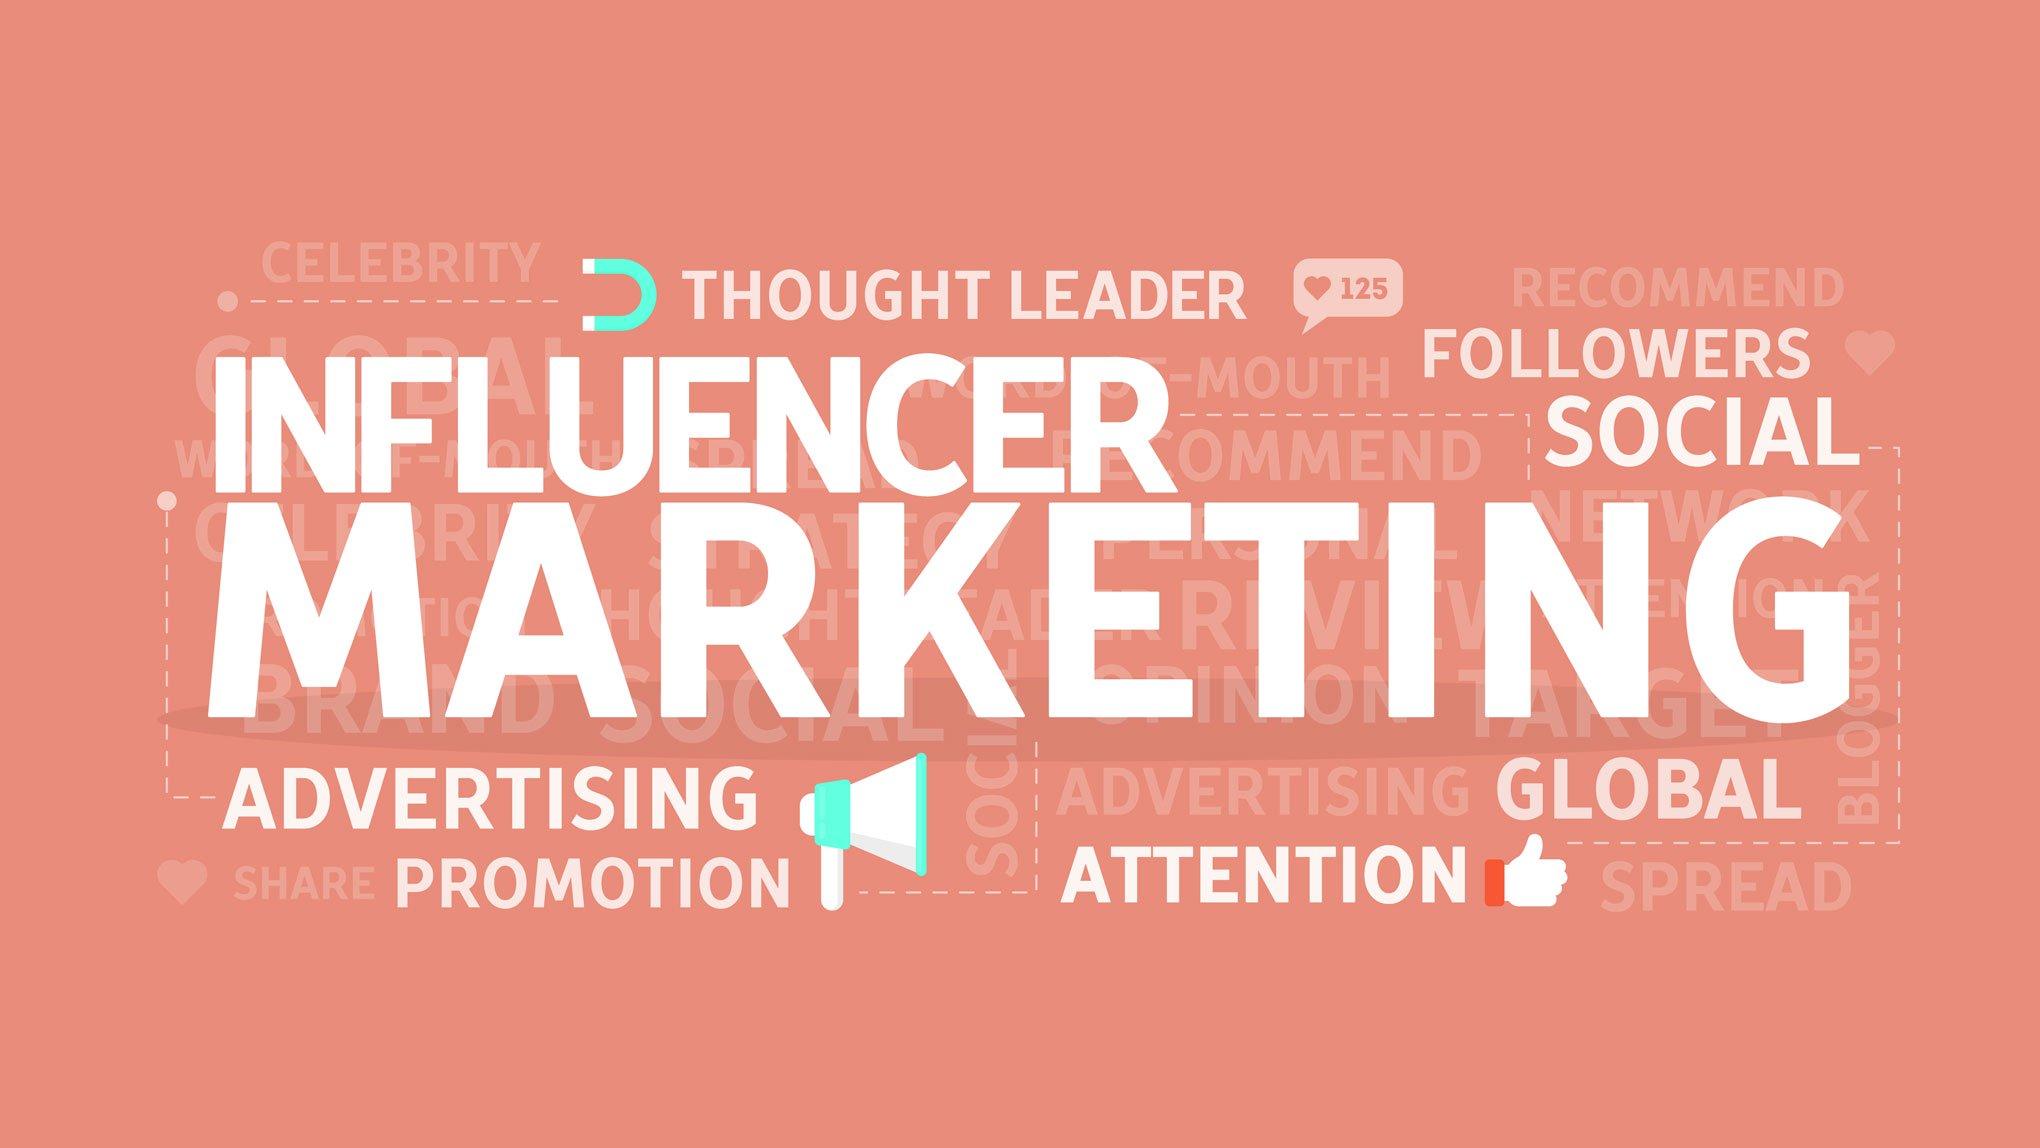 micro-influencer marketing